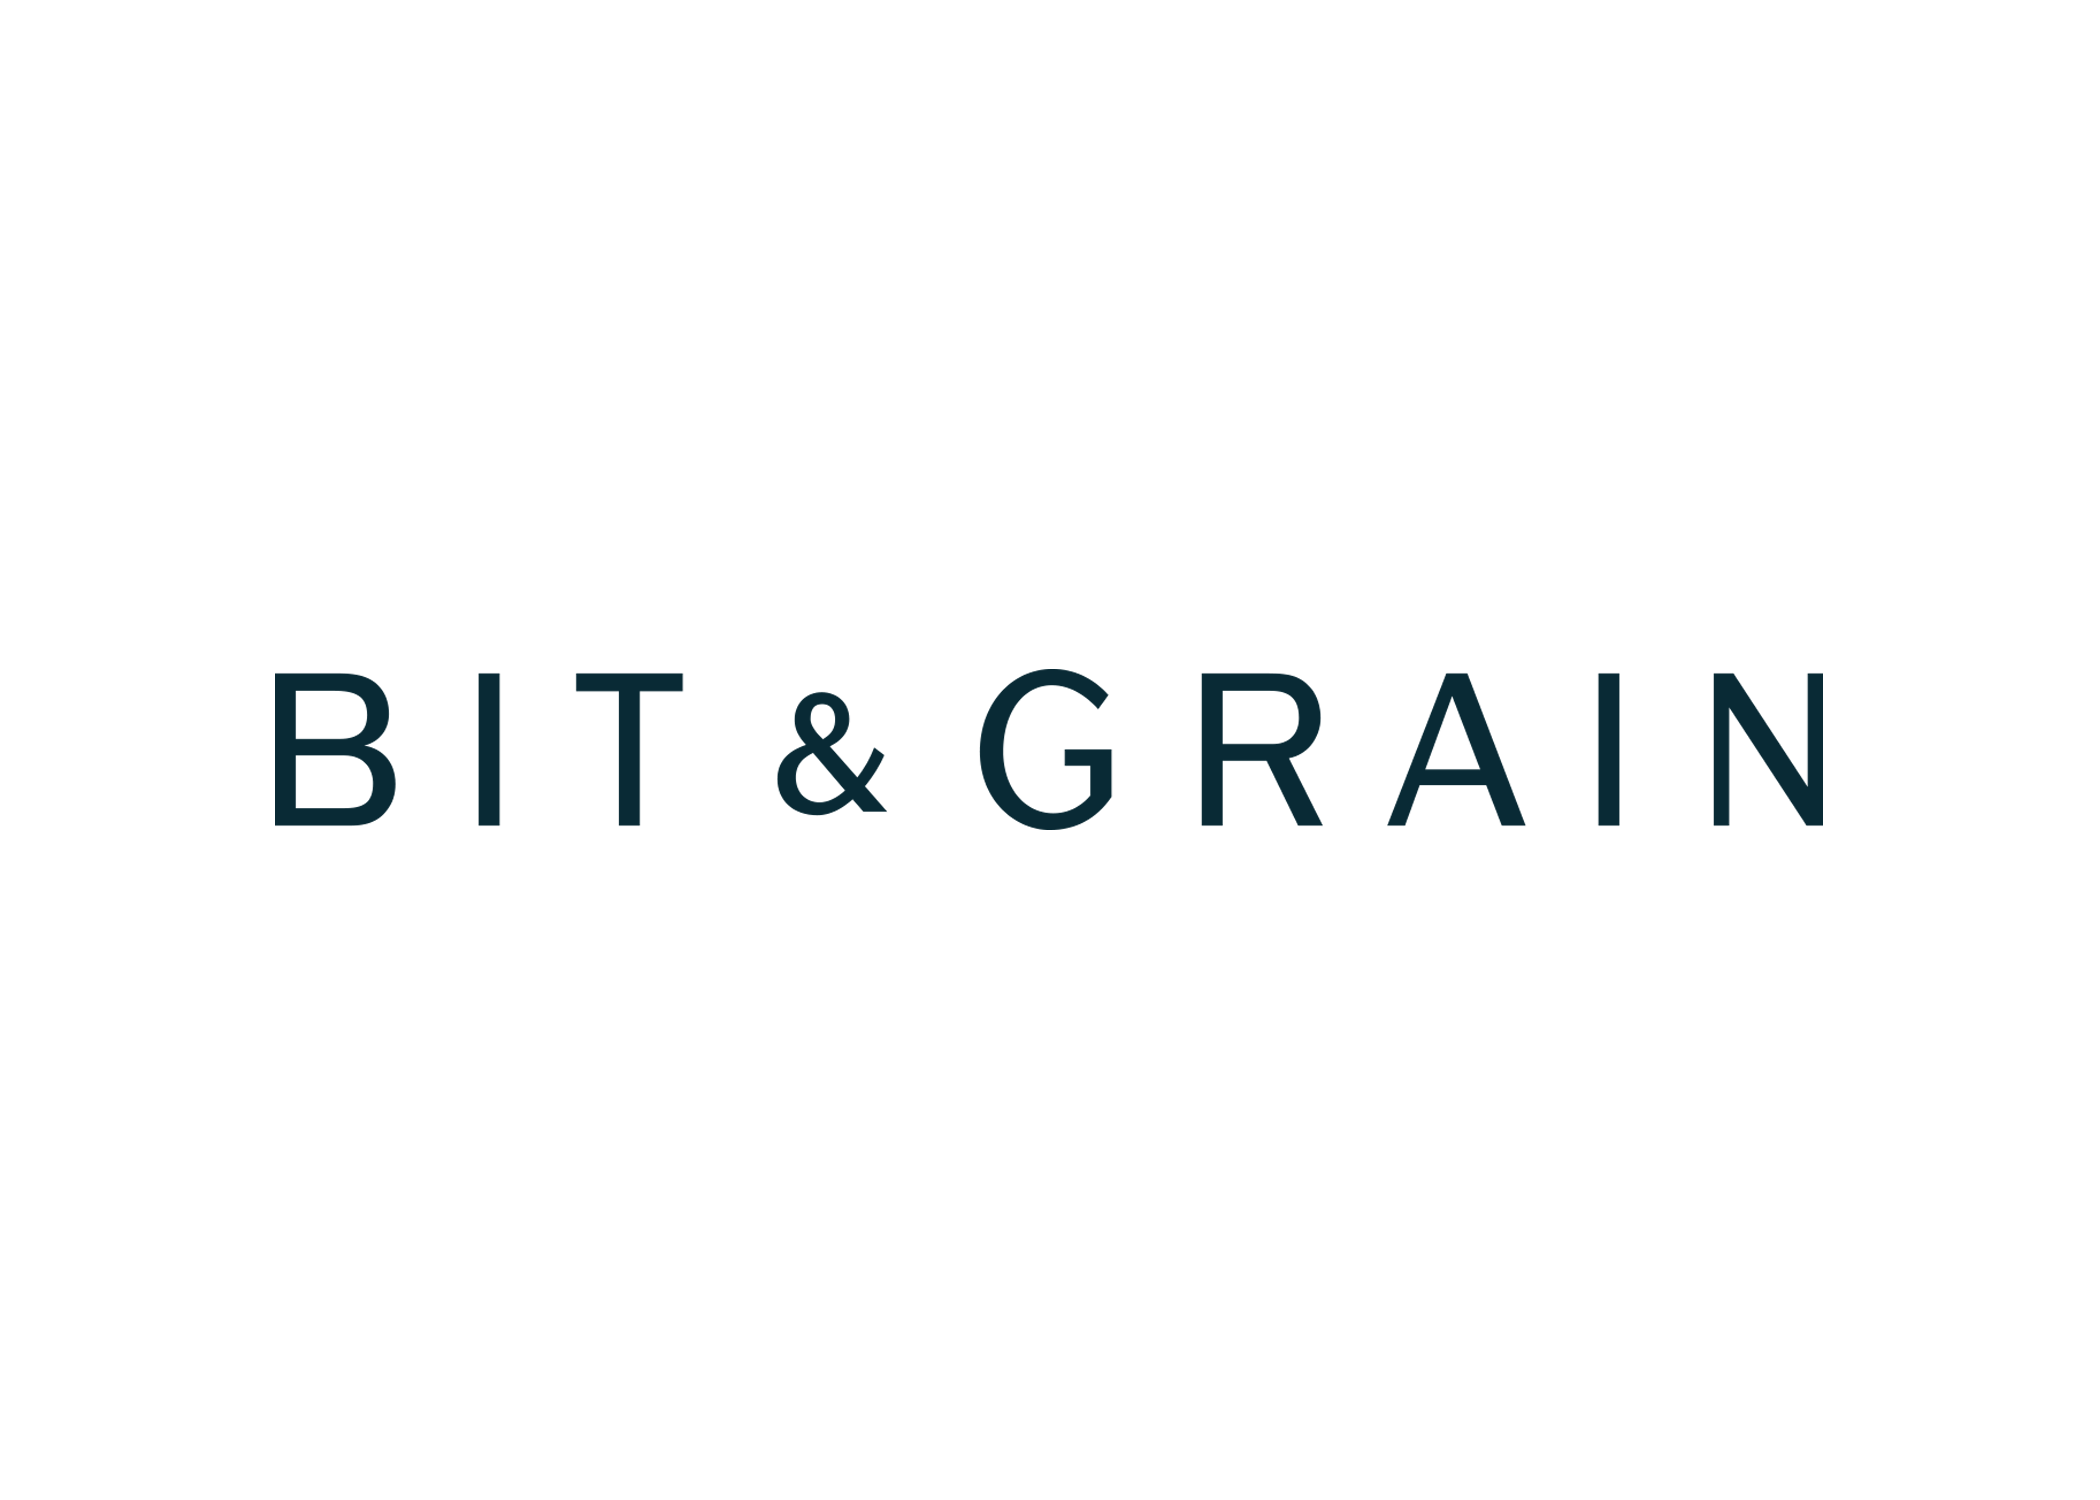 Design by Good South / Bit & Grain Logo Design